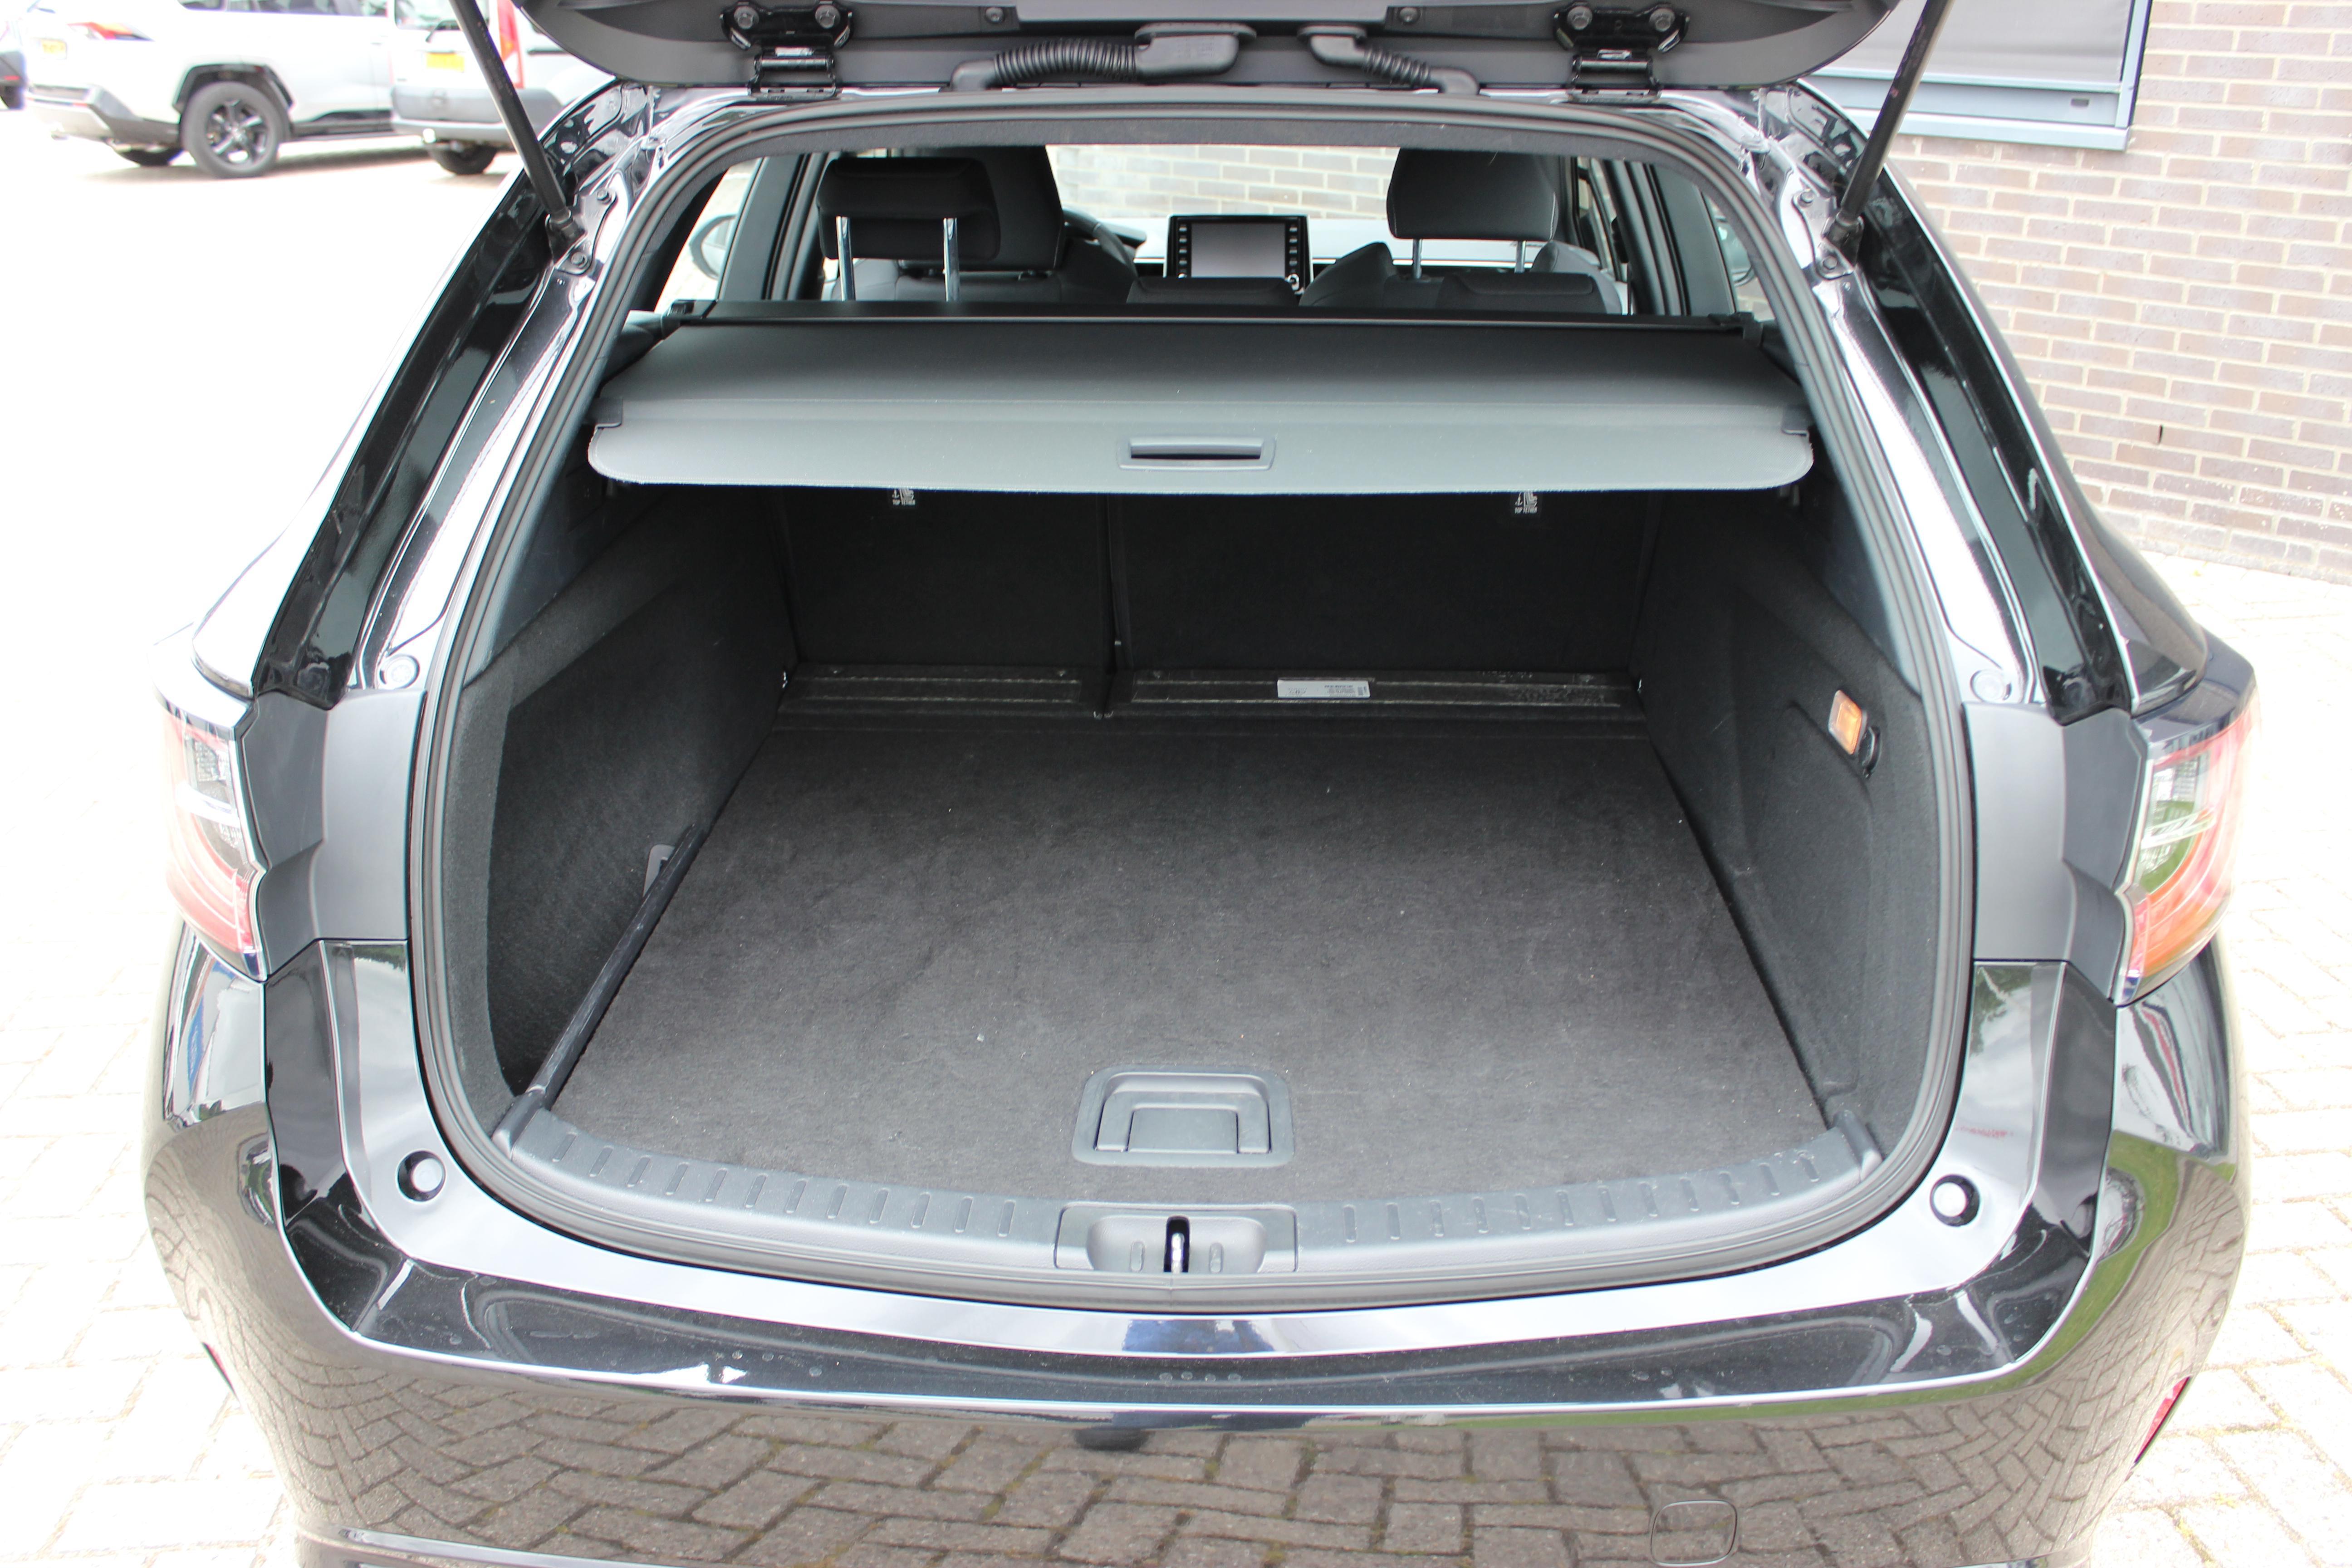 Toyota Corolla TS Hybrid 2.0 achterbak